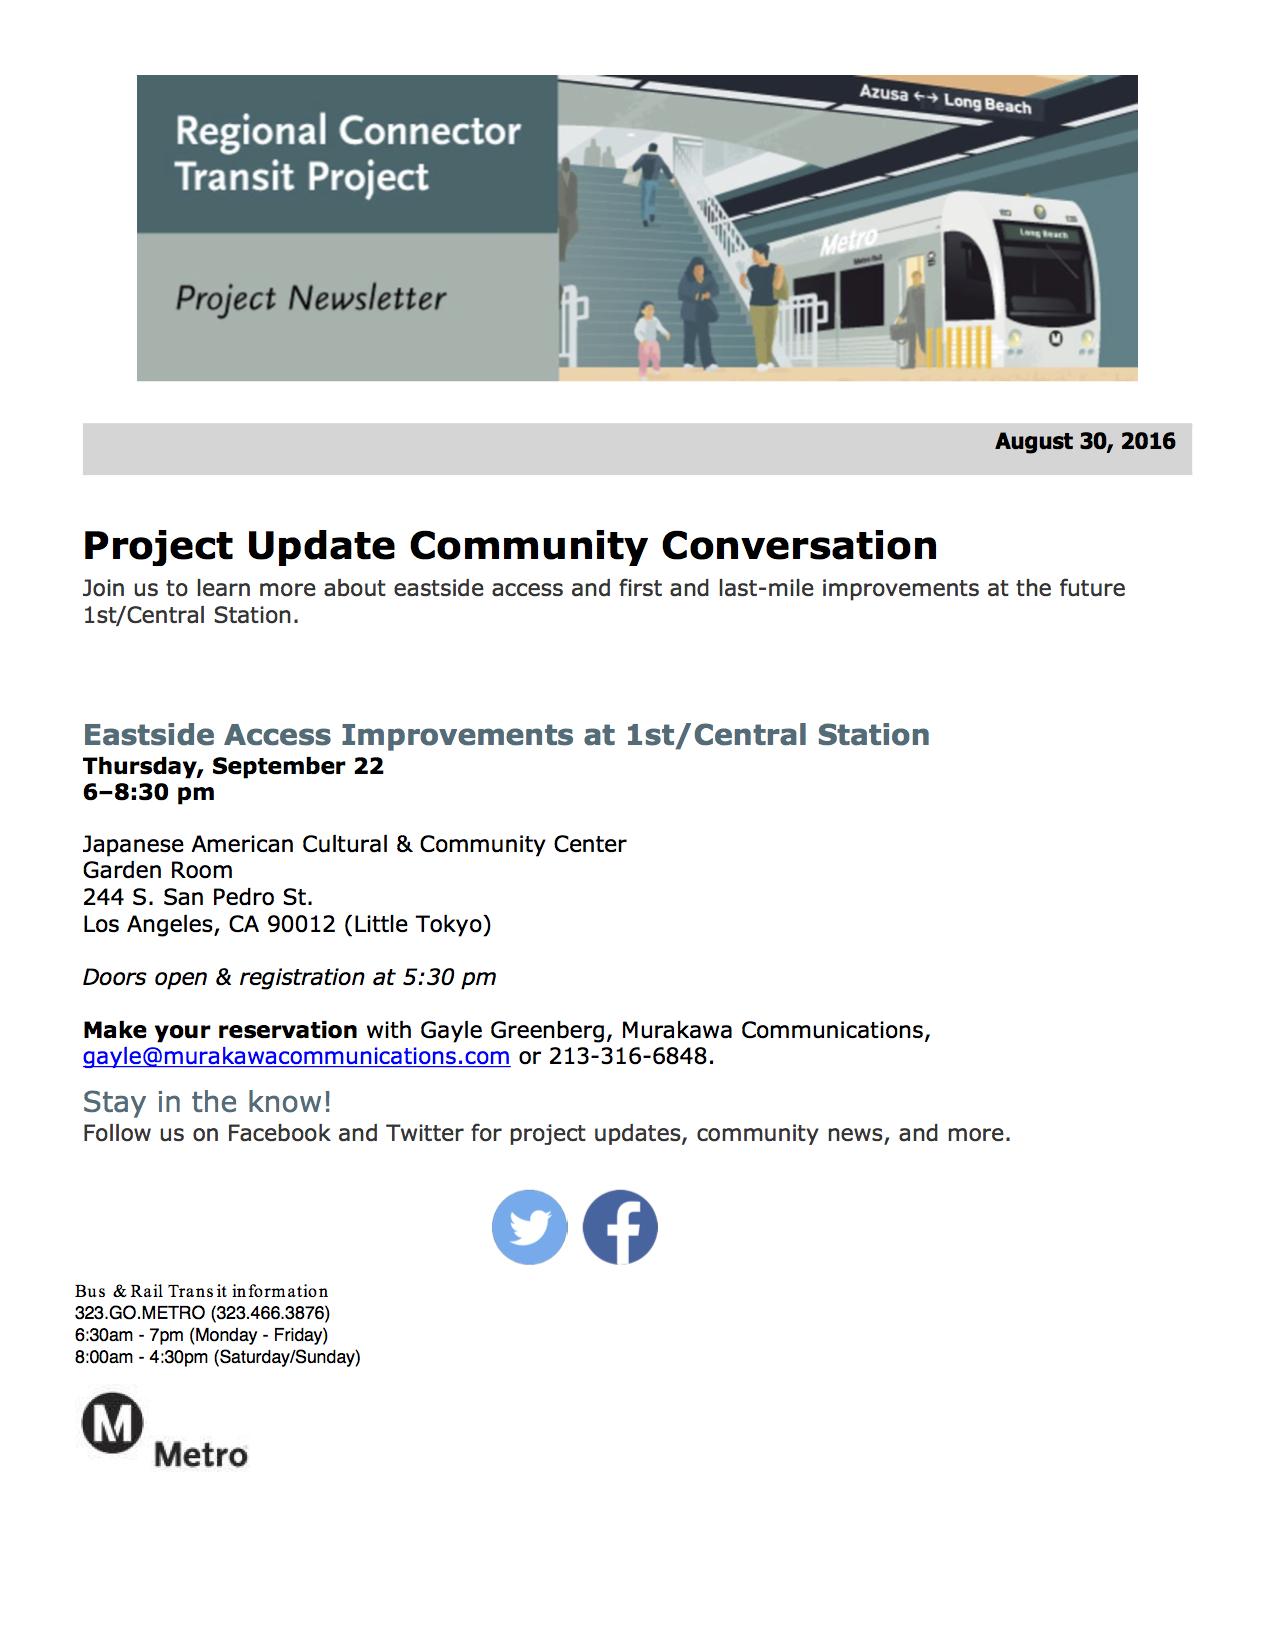 Printable-Community-Conversation-Invite